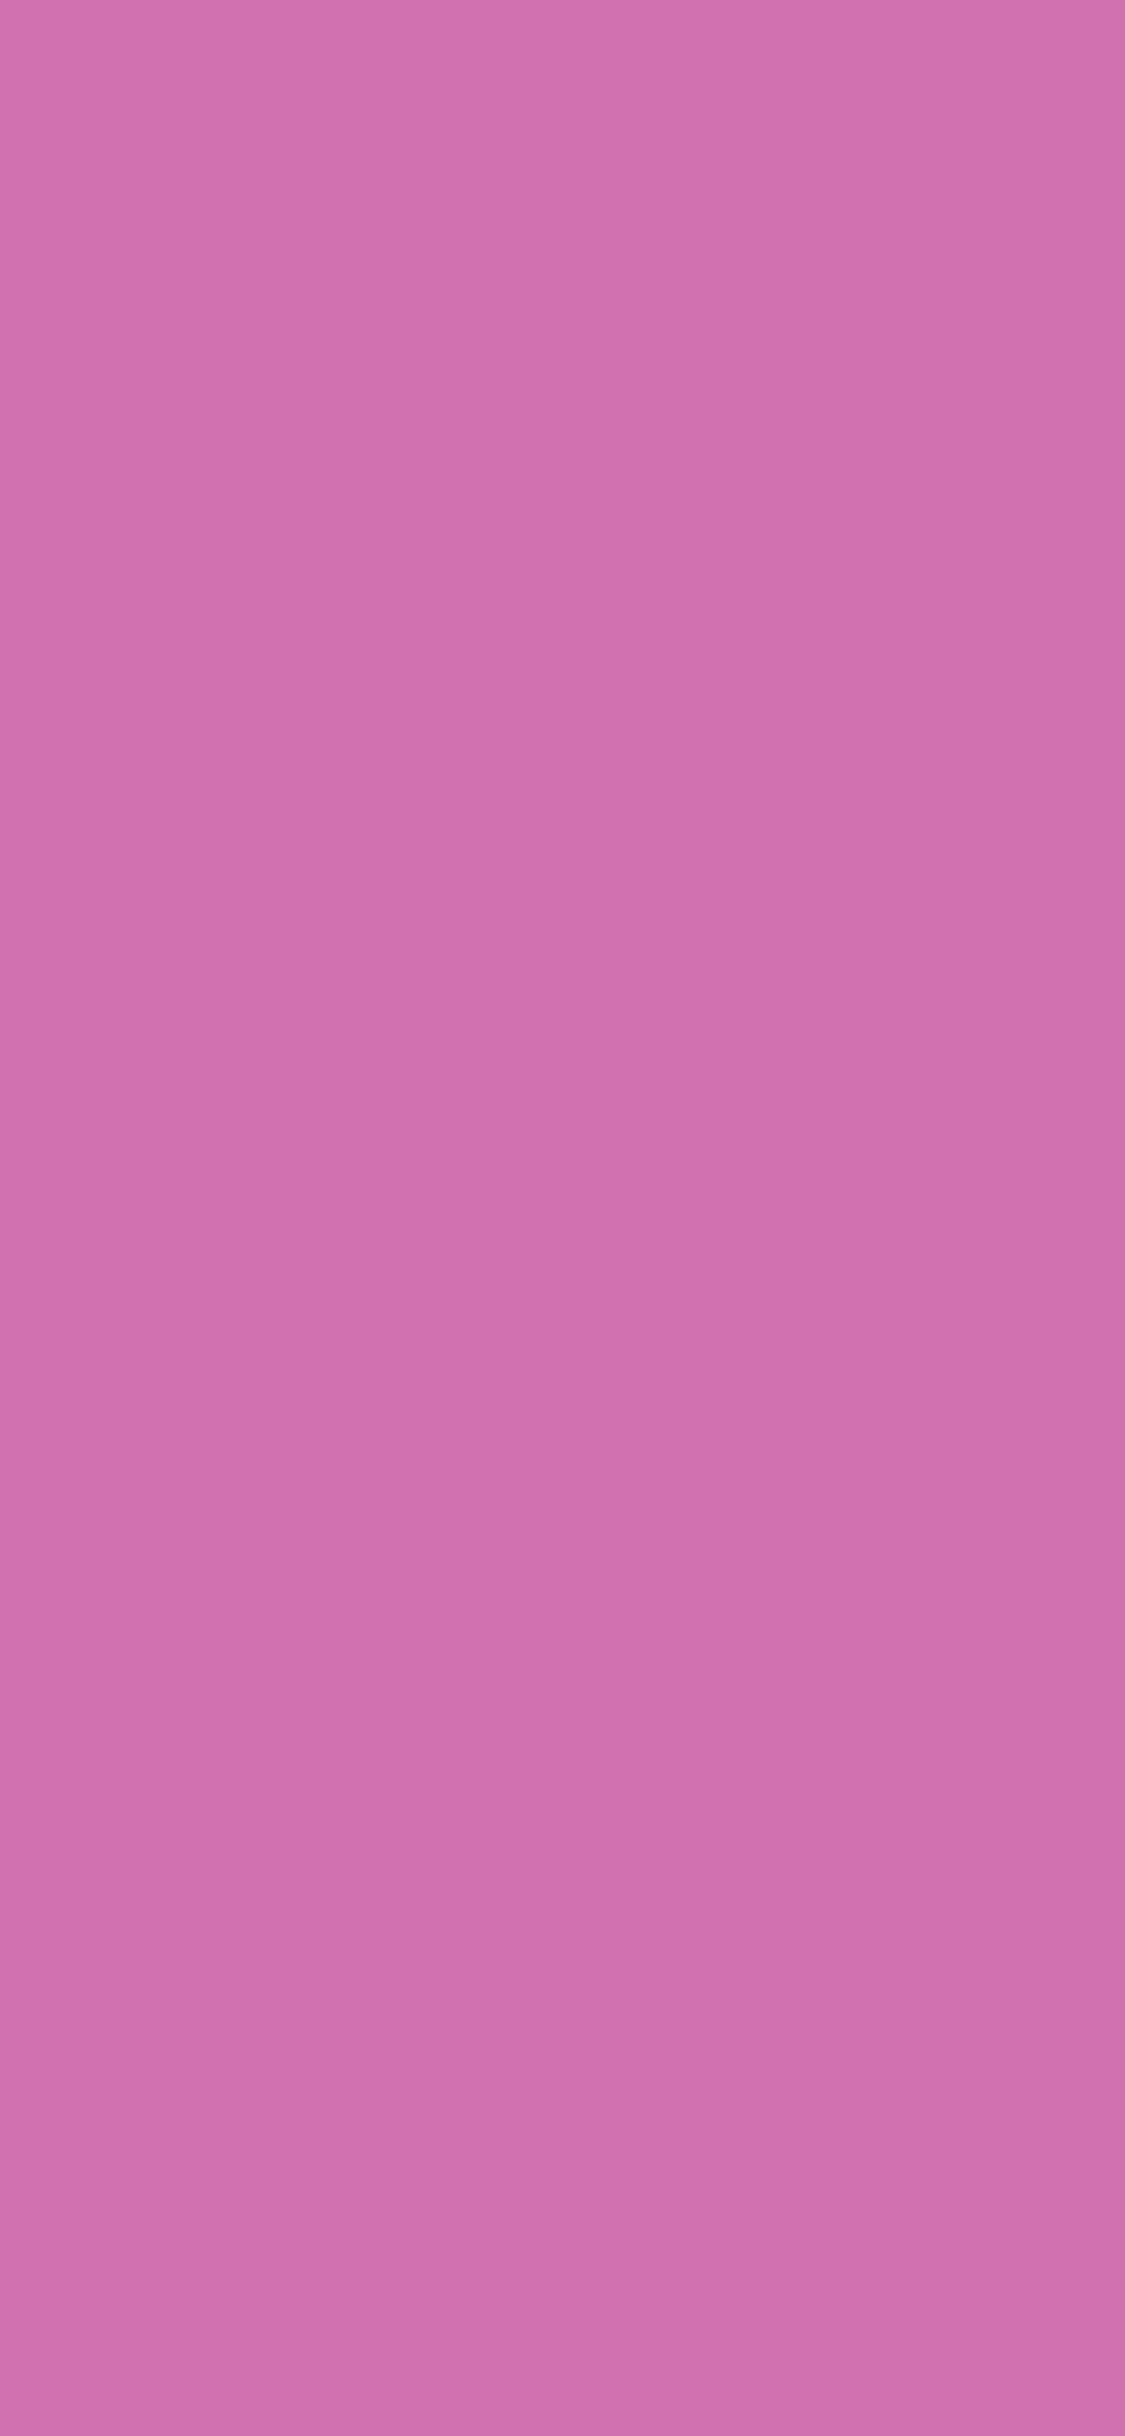 1125x2436 Sky Magenta Solid Color Background